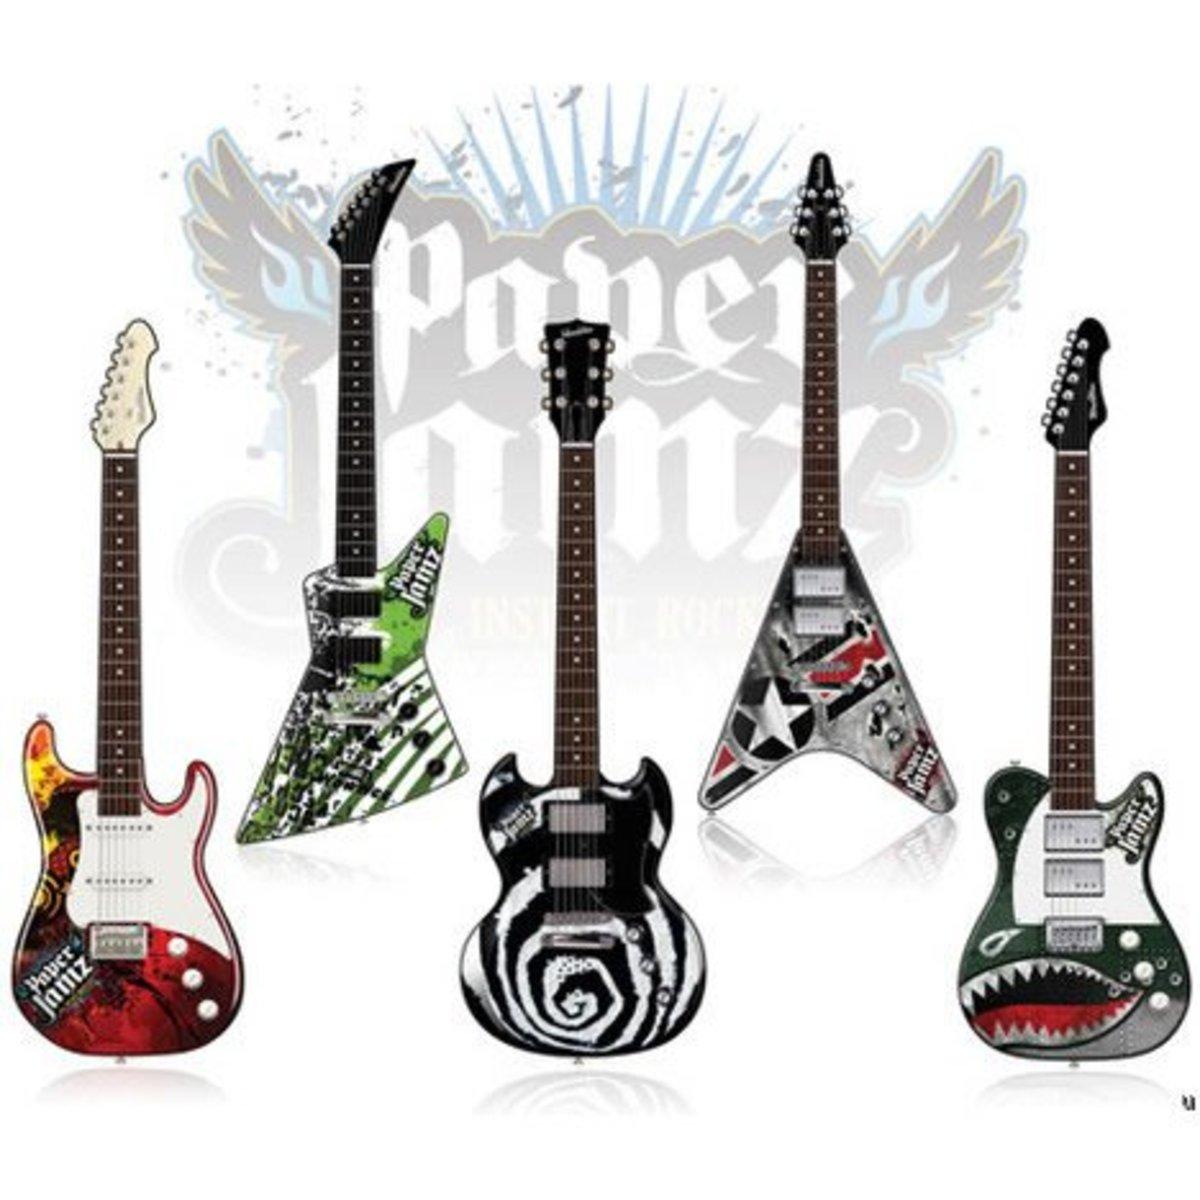 buy-paper-jamz-guitar